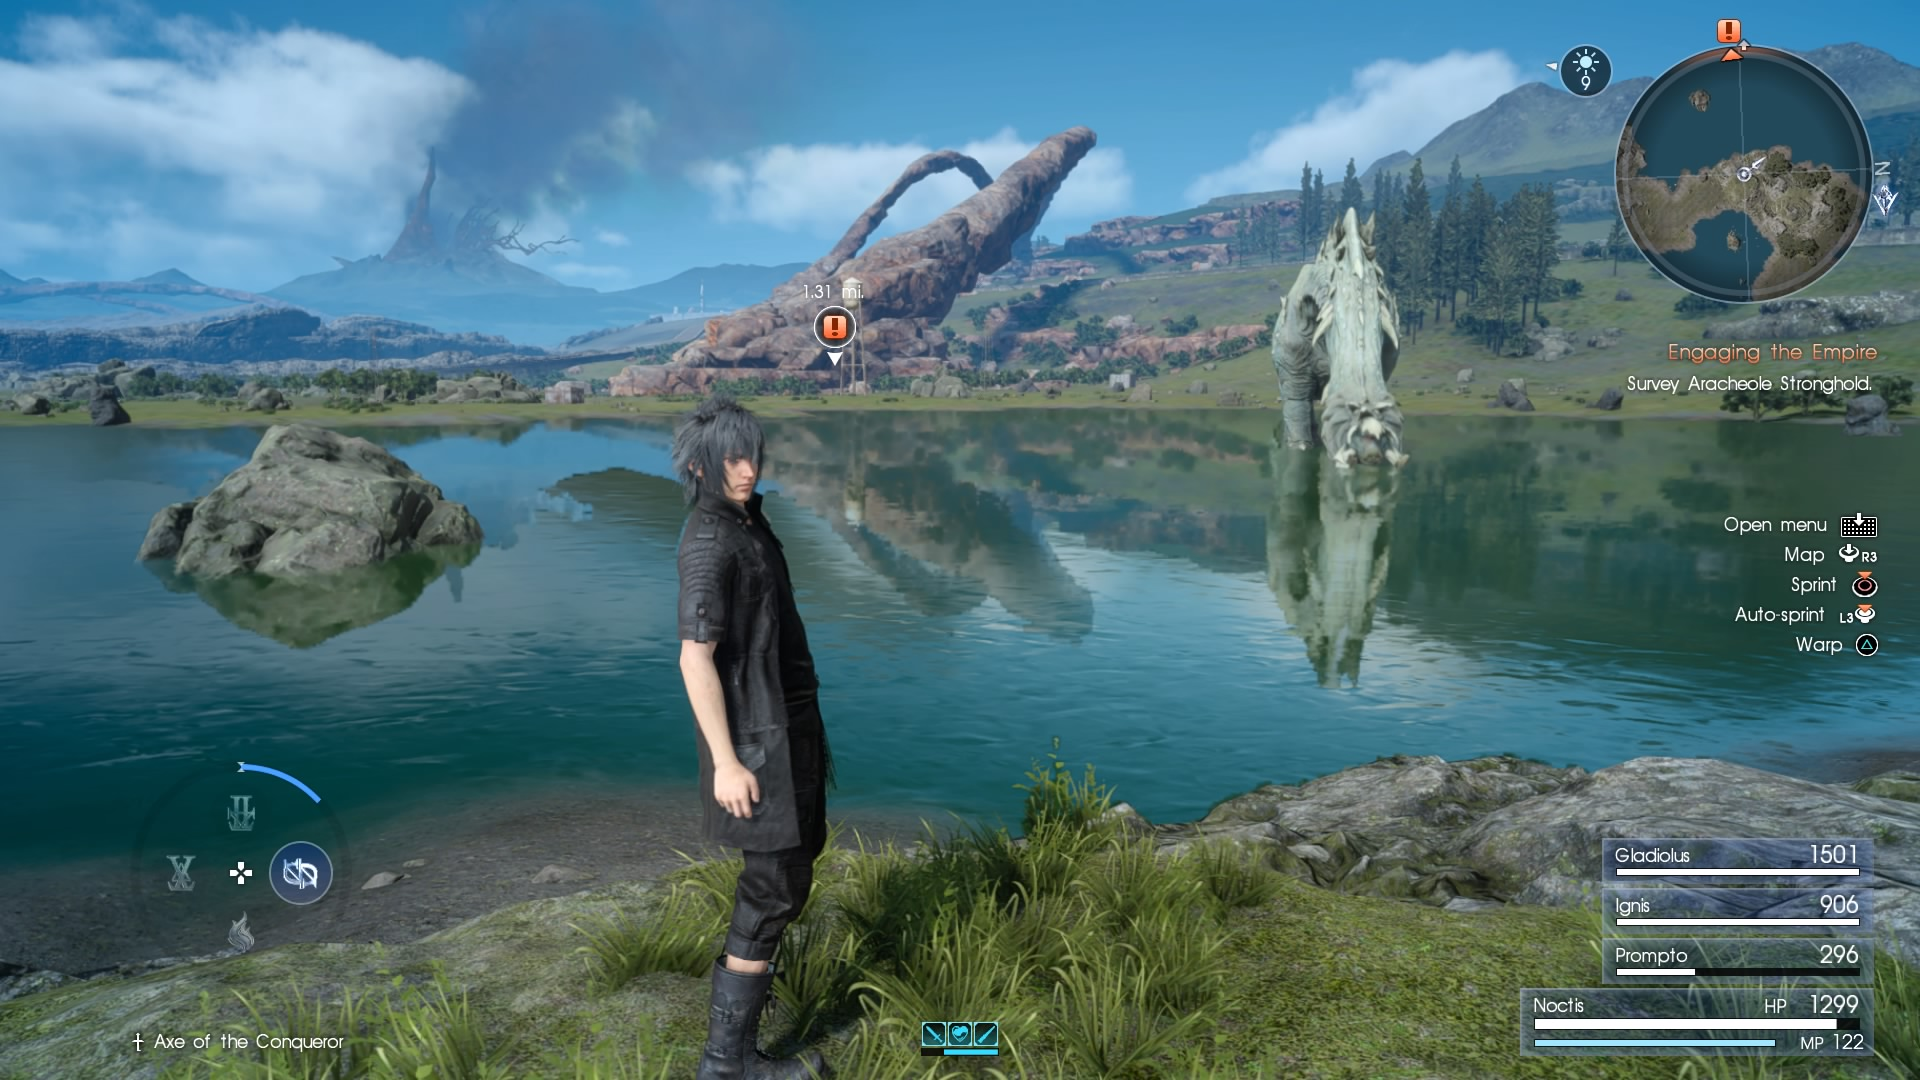 Review: Final Fantasy XV